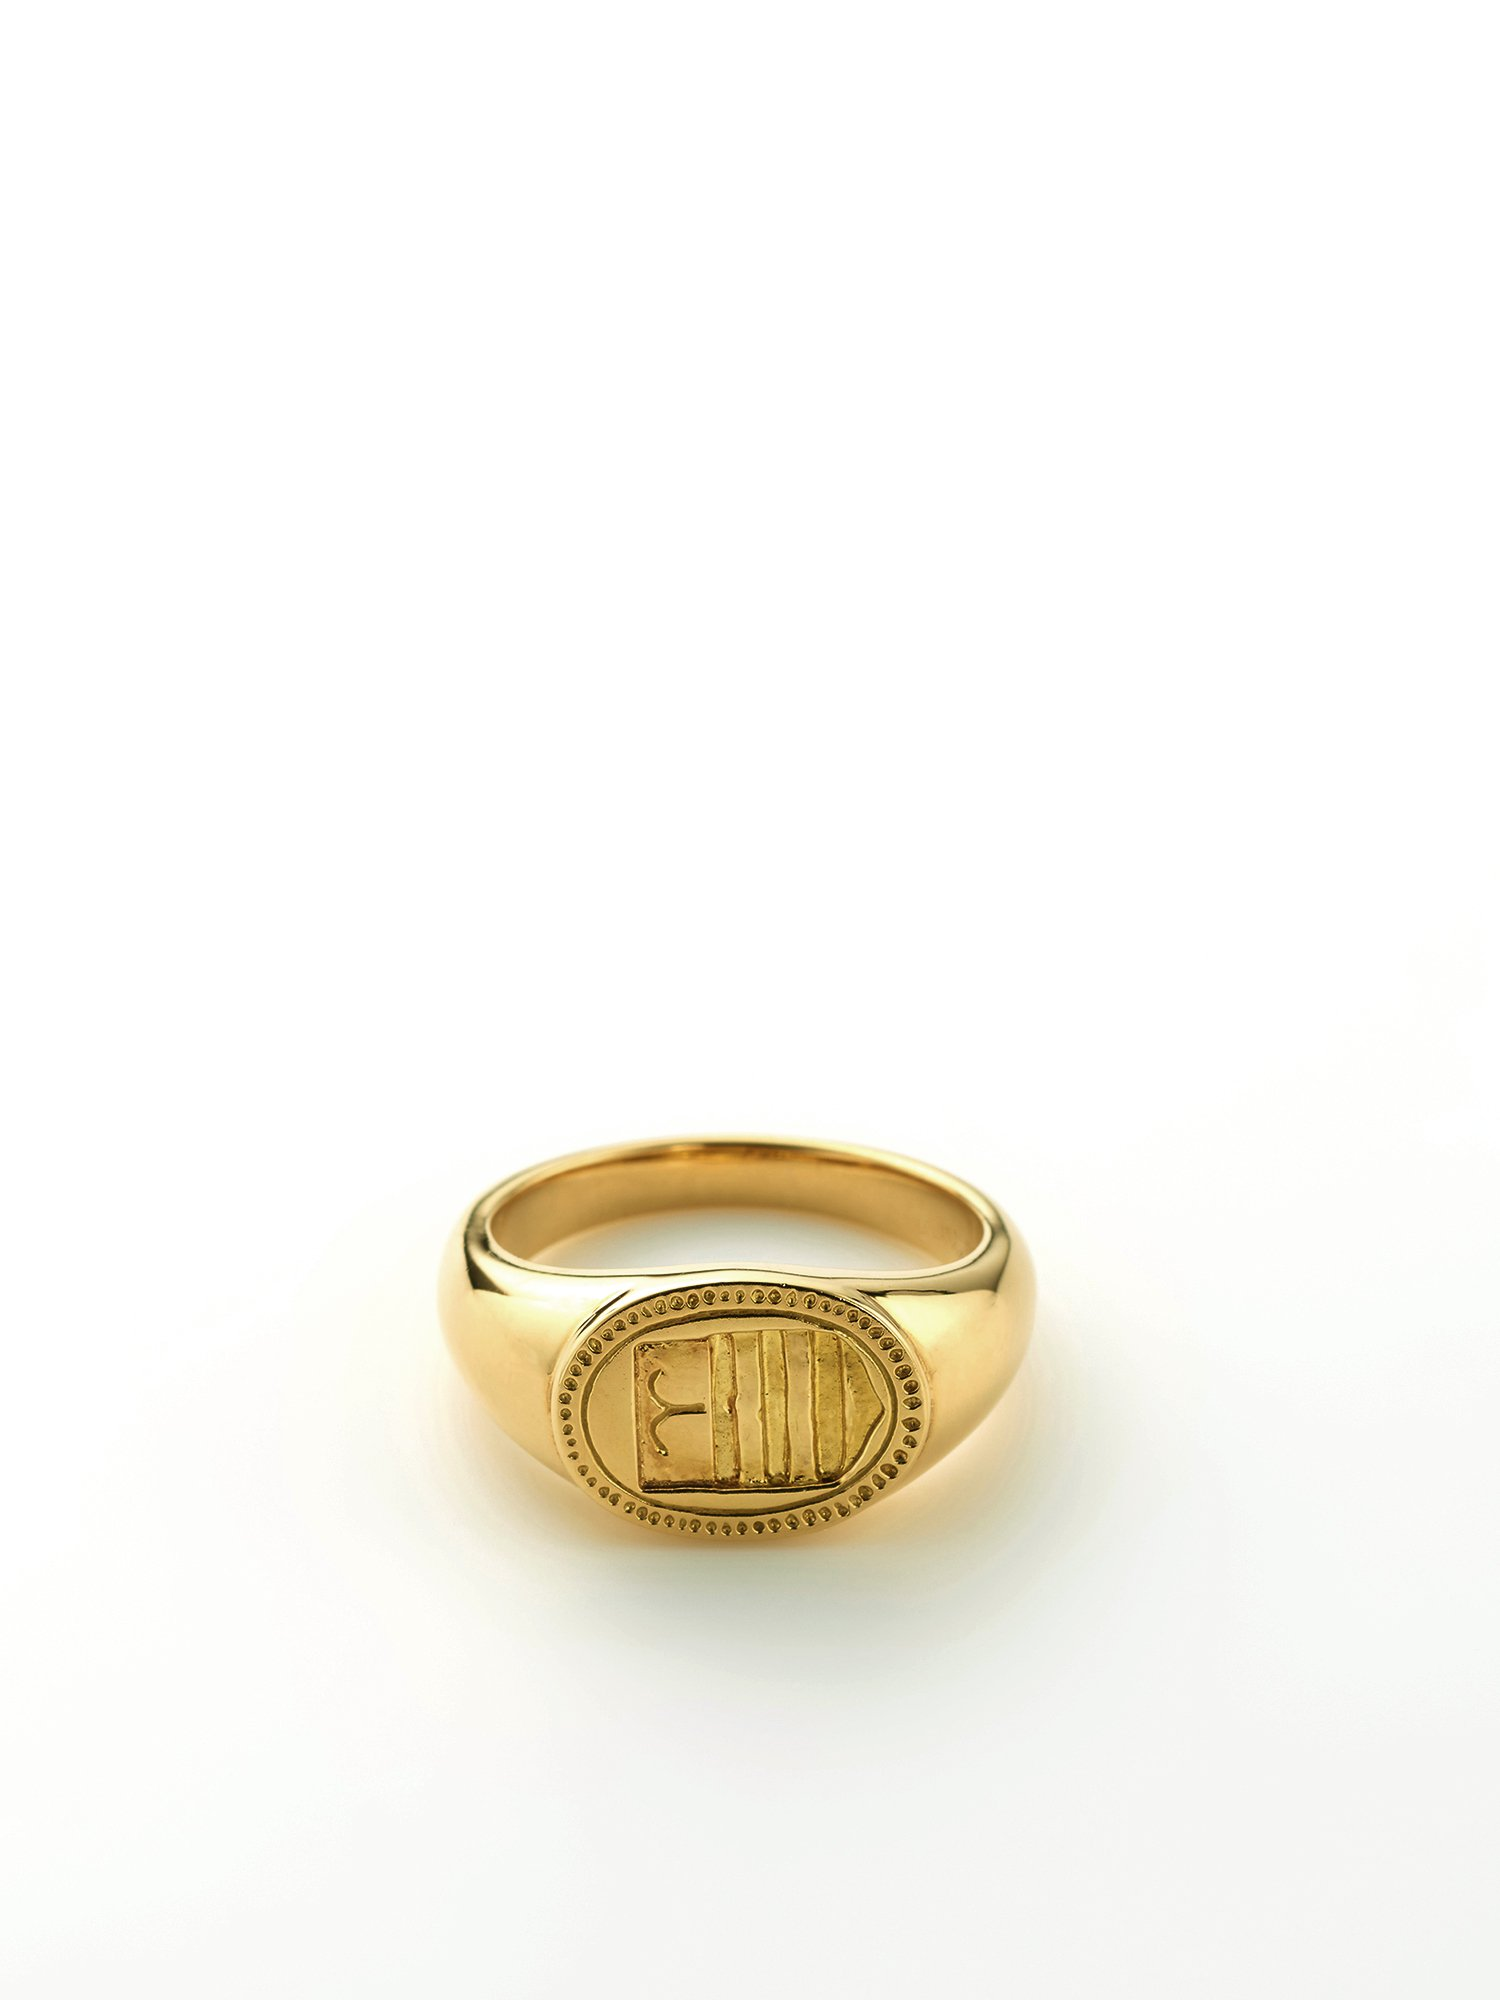 HELIOS / Zodiac signet ring